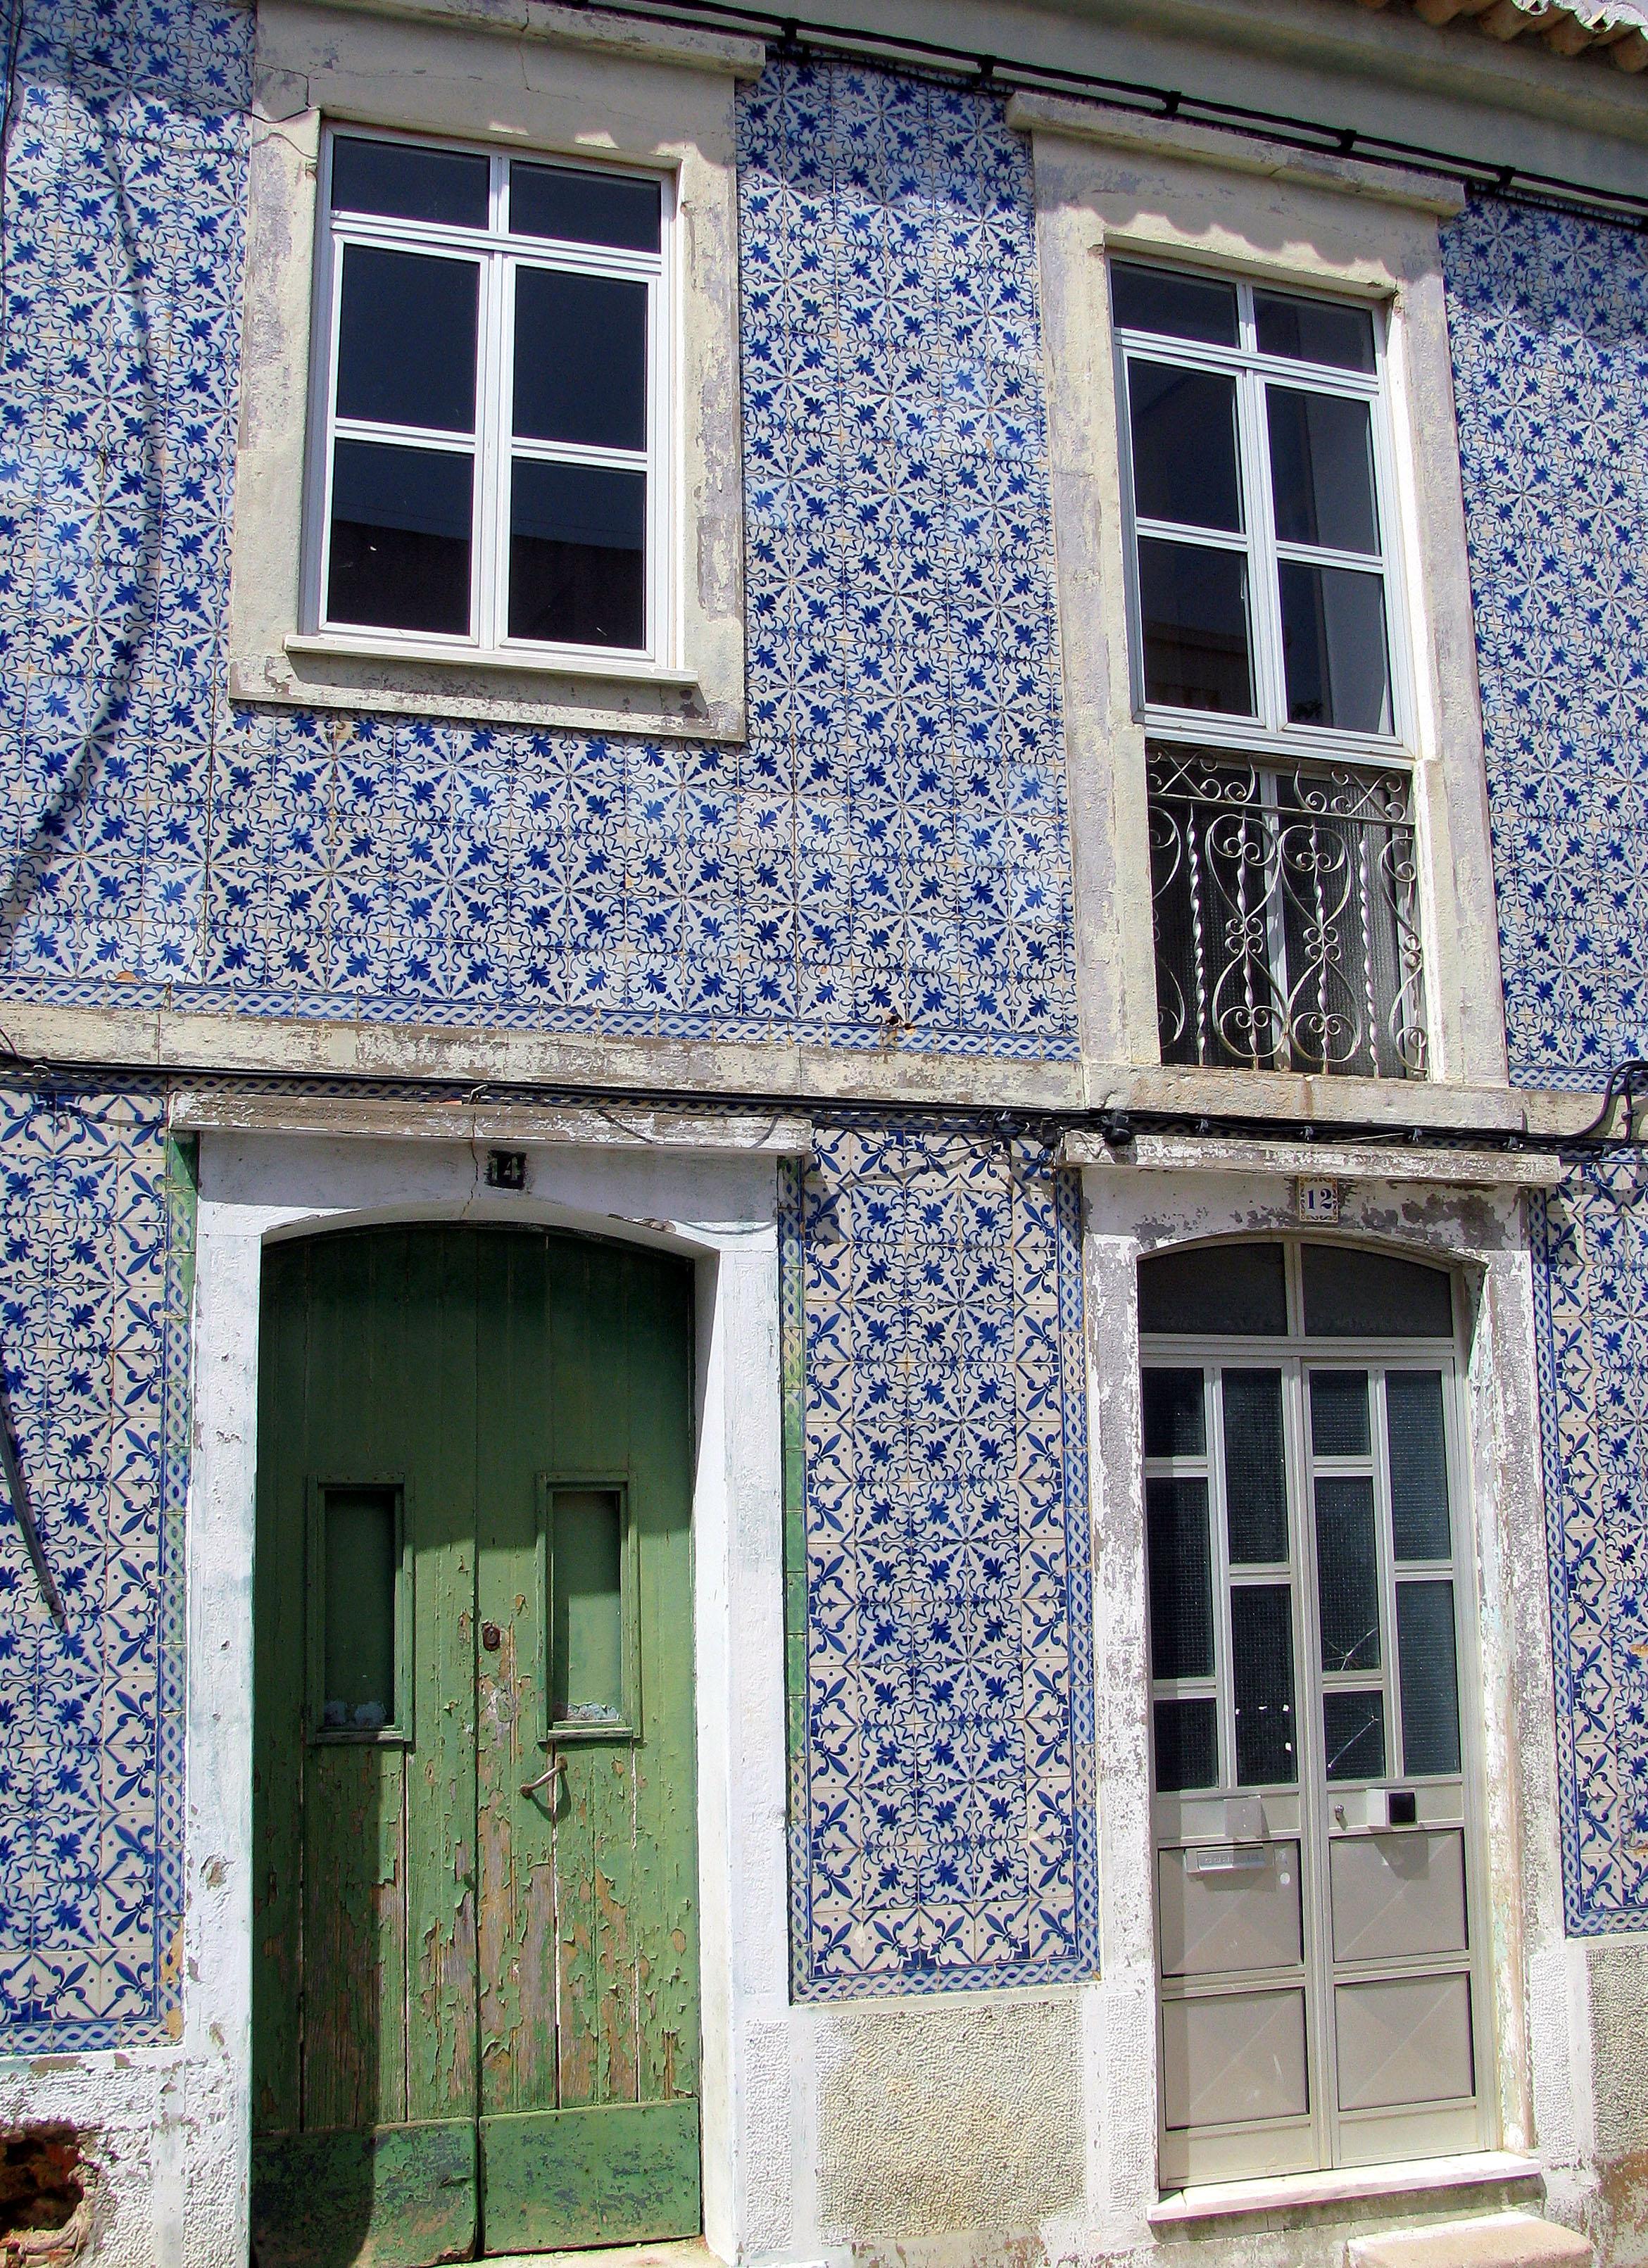 Tiles ice tea and toilet rolls algarve blog for House tiles